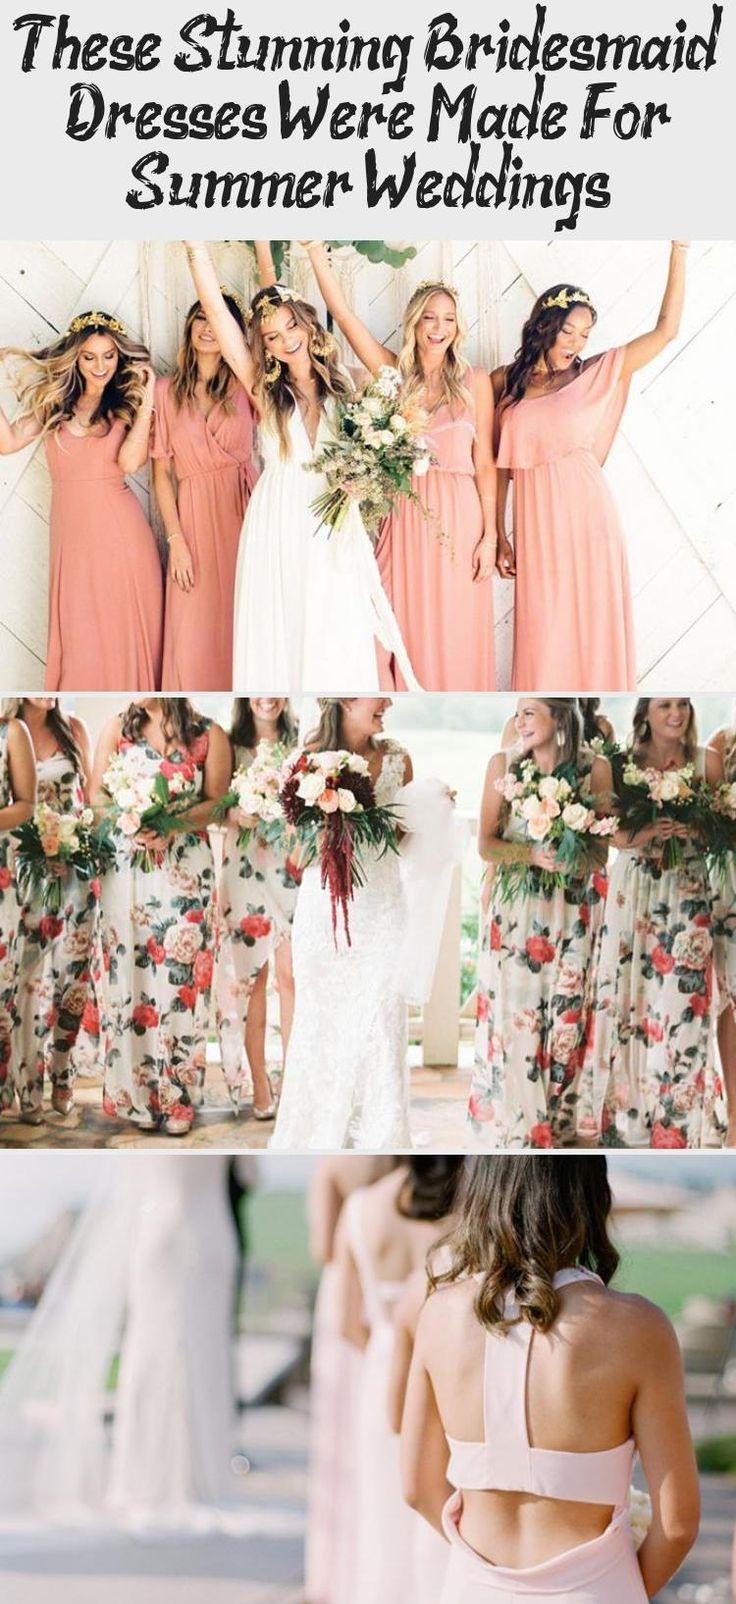 The Most Stunning Summer Bridesmaid Dresses Of 2018 #DifferentBridesmaidDresses #BridesmaidDressesMismatched #BridesmaidDressesMuslim #BridesmaidDressesBeach #BridesmaidDressesSpring